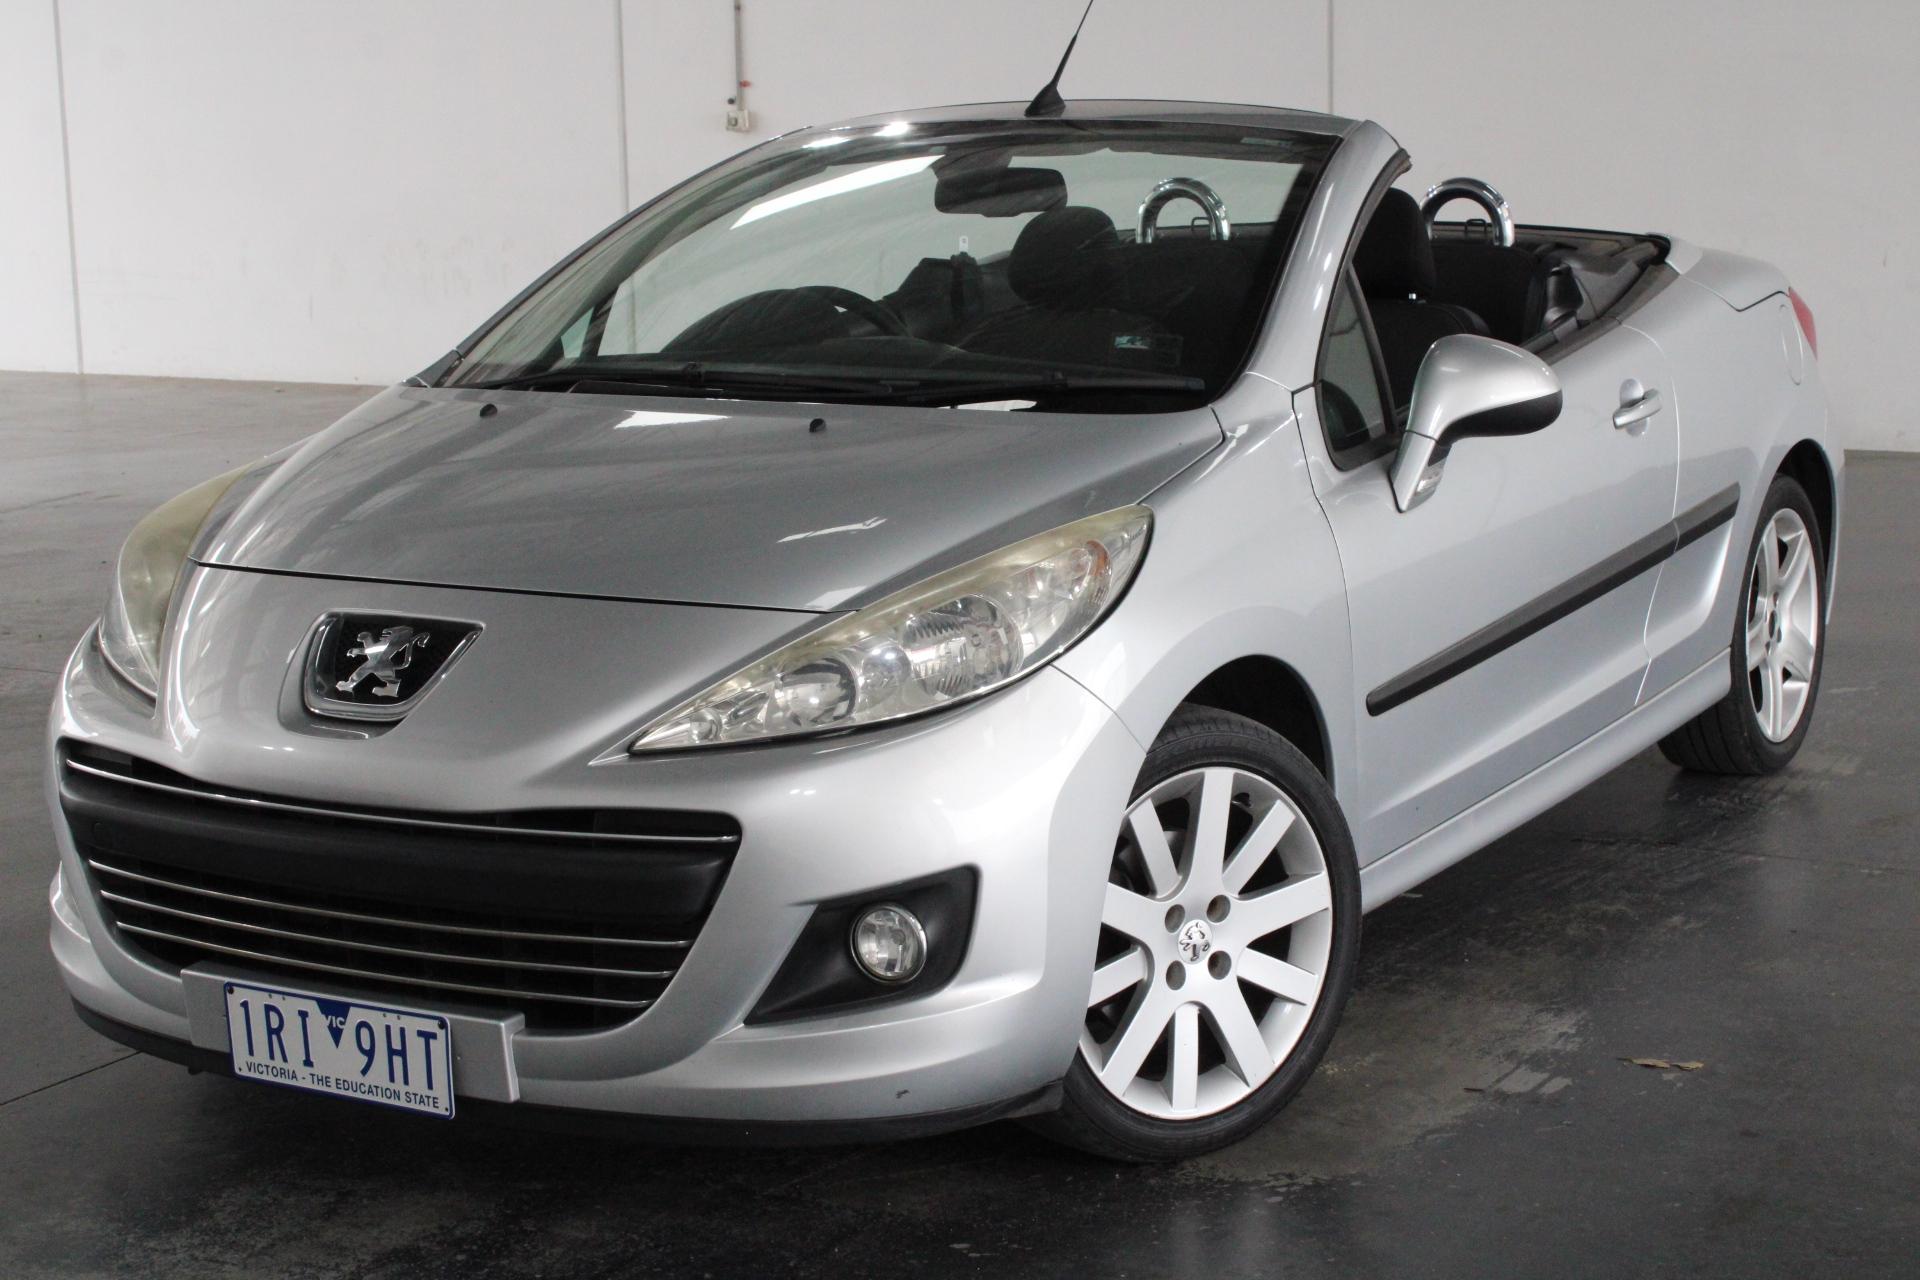 2010 Peugeot 207 CC 1.6 Automatic Convertible